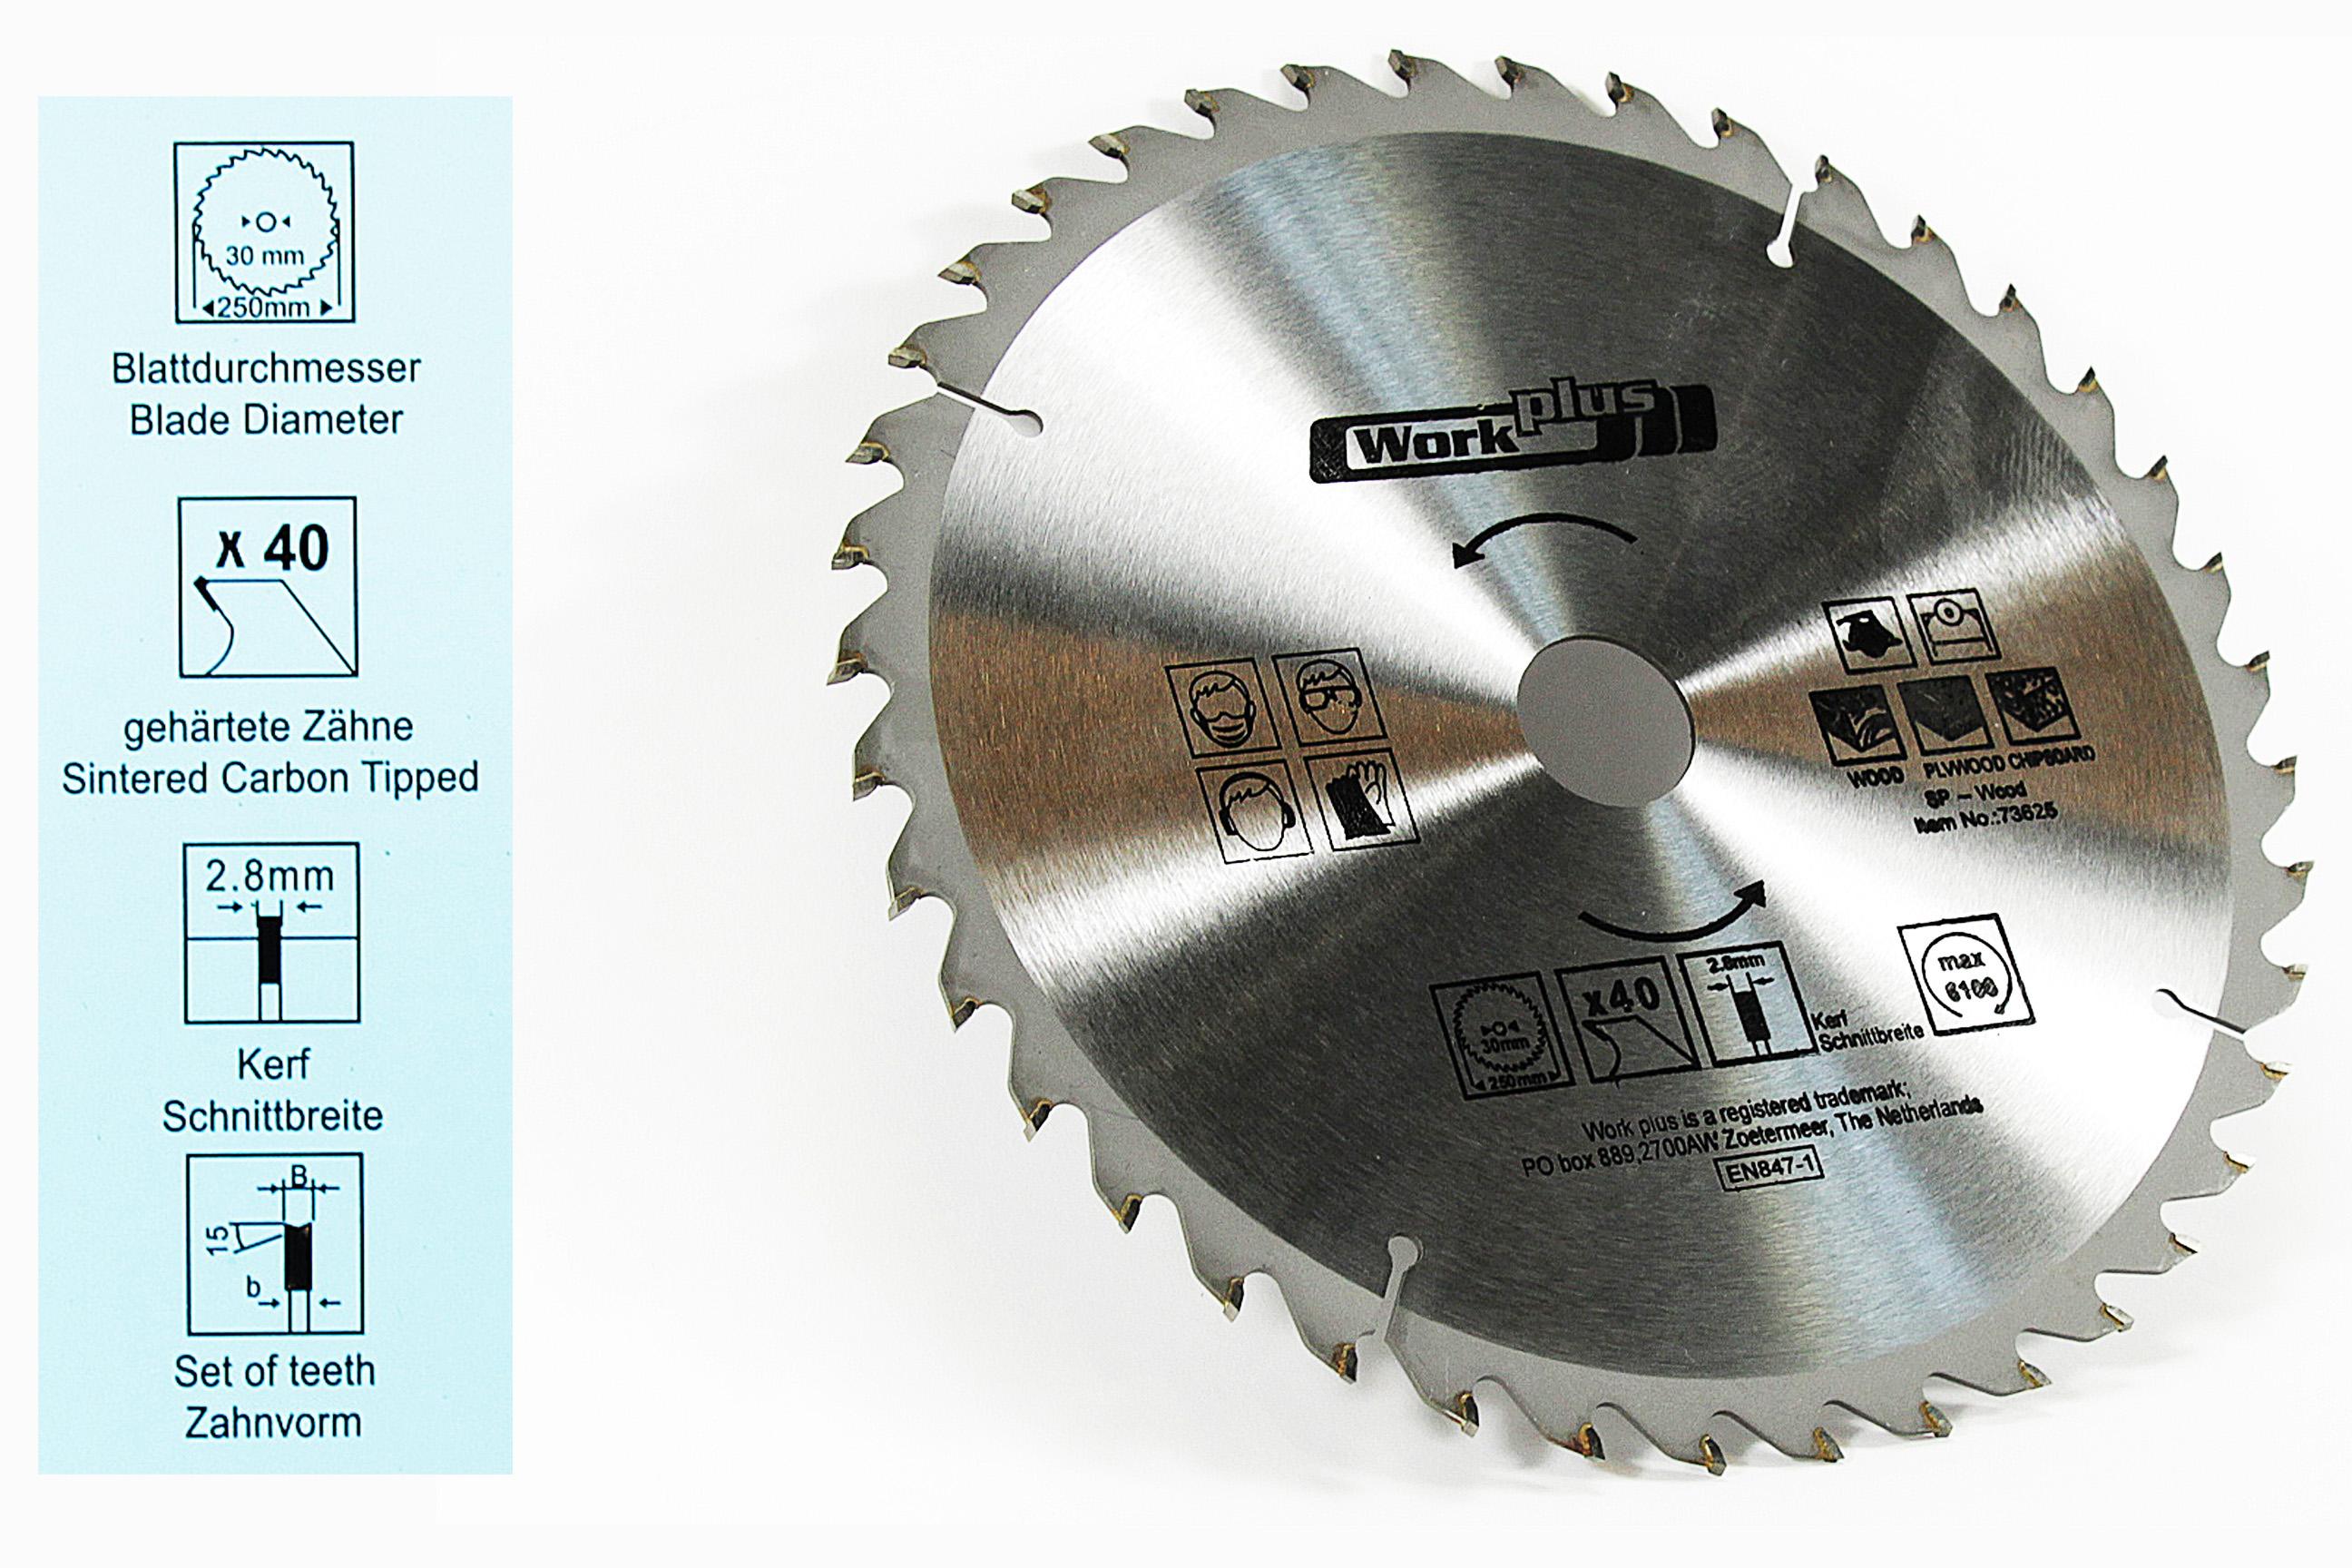 NEU HM Kreissägeblatt 24 Zähne für Holz Sägeblatt Säge Kreissäge Blatt 350 mm